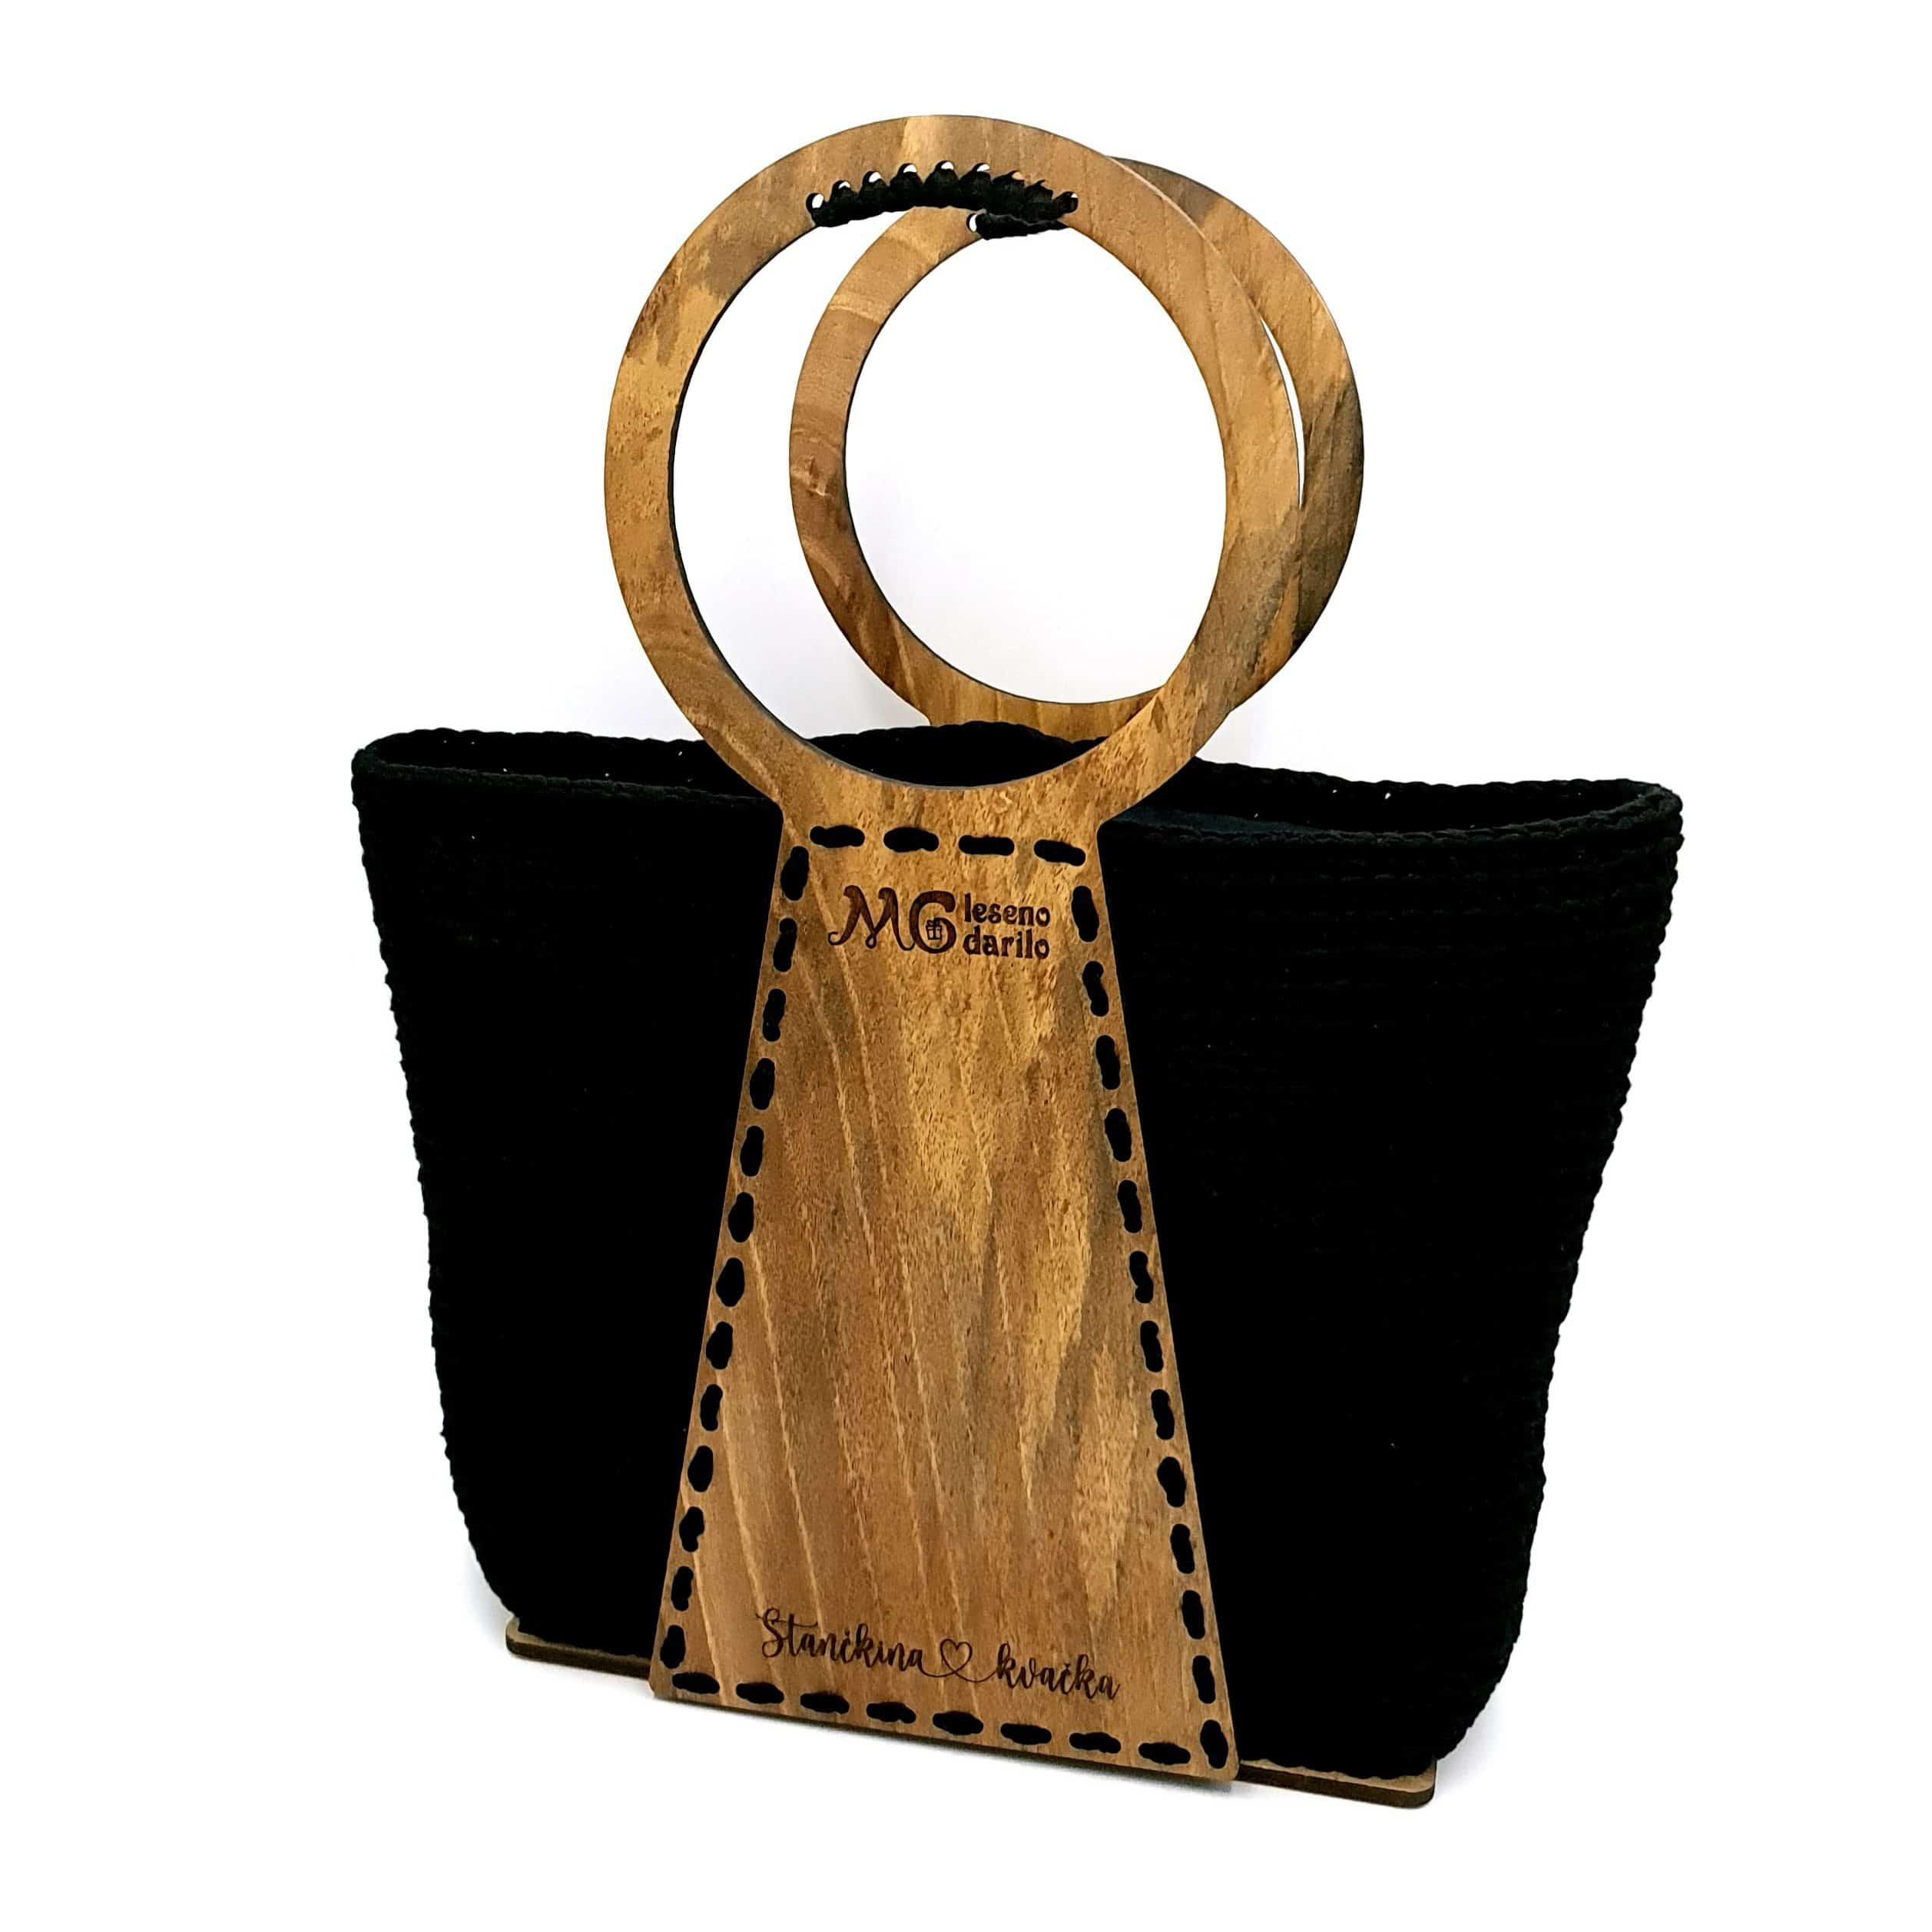 Unikatna kvačkana torbica